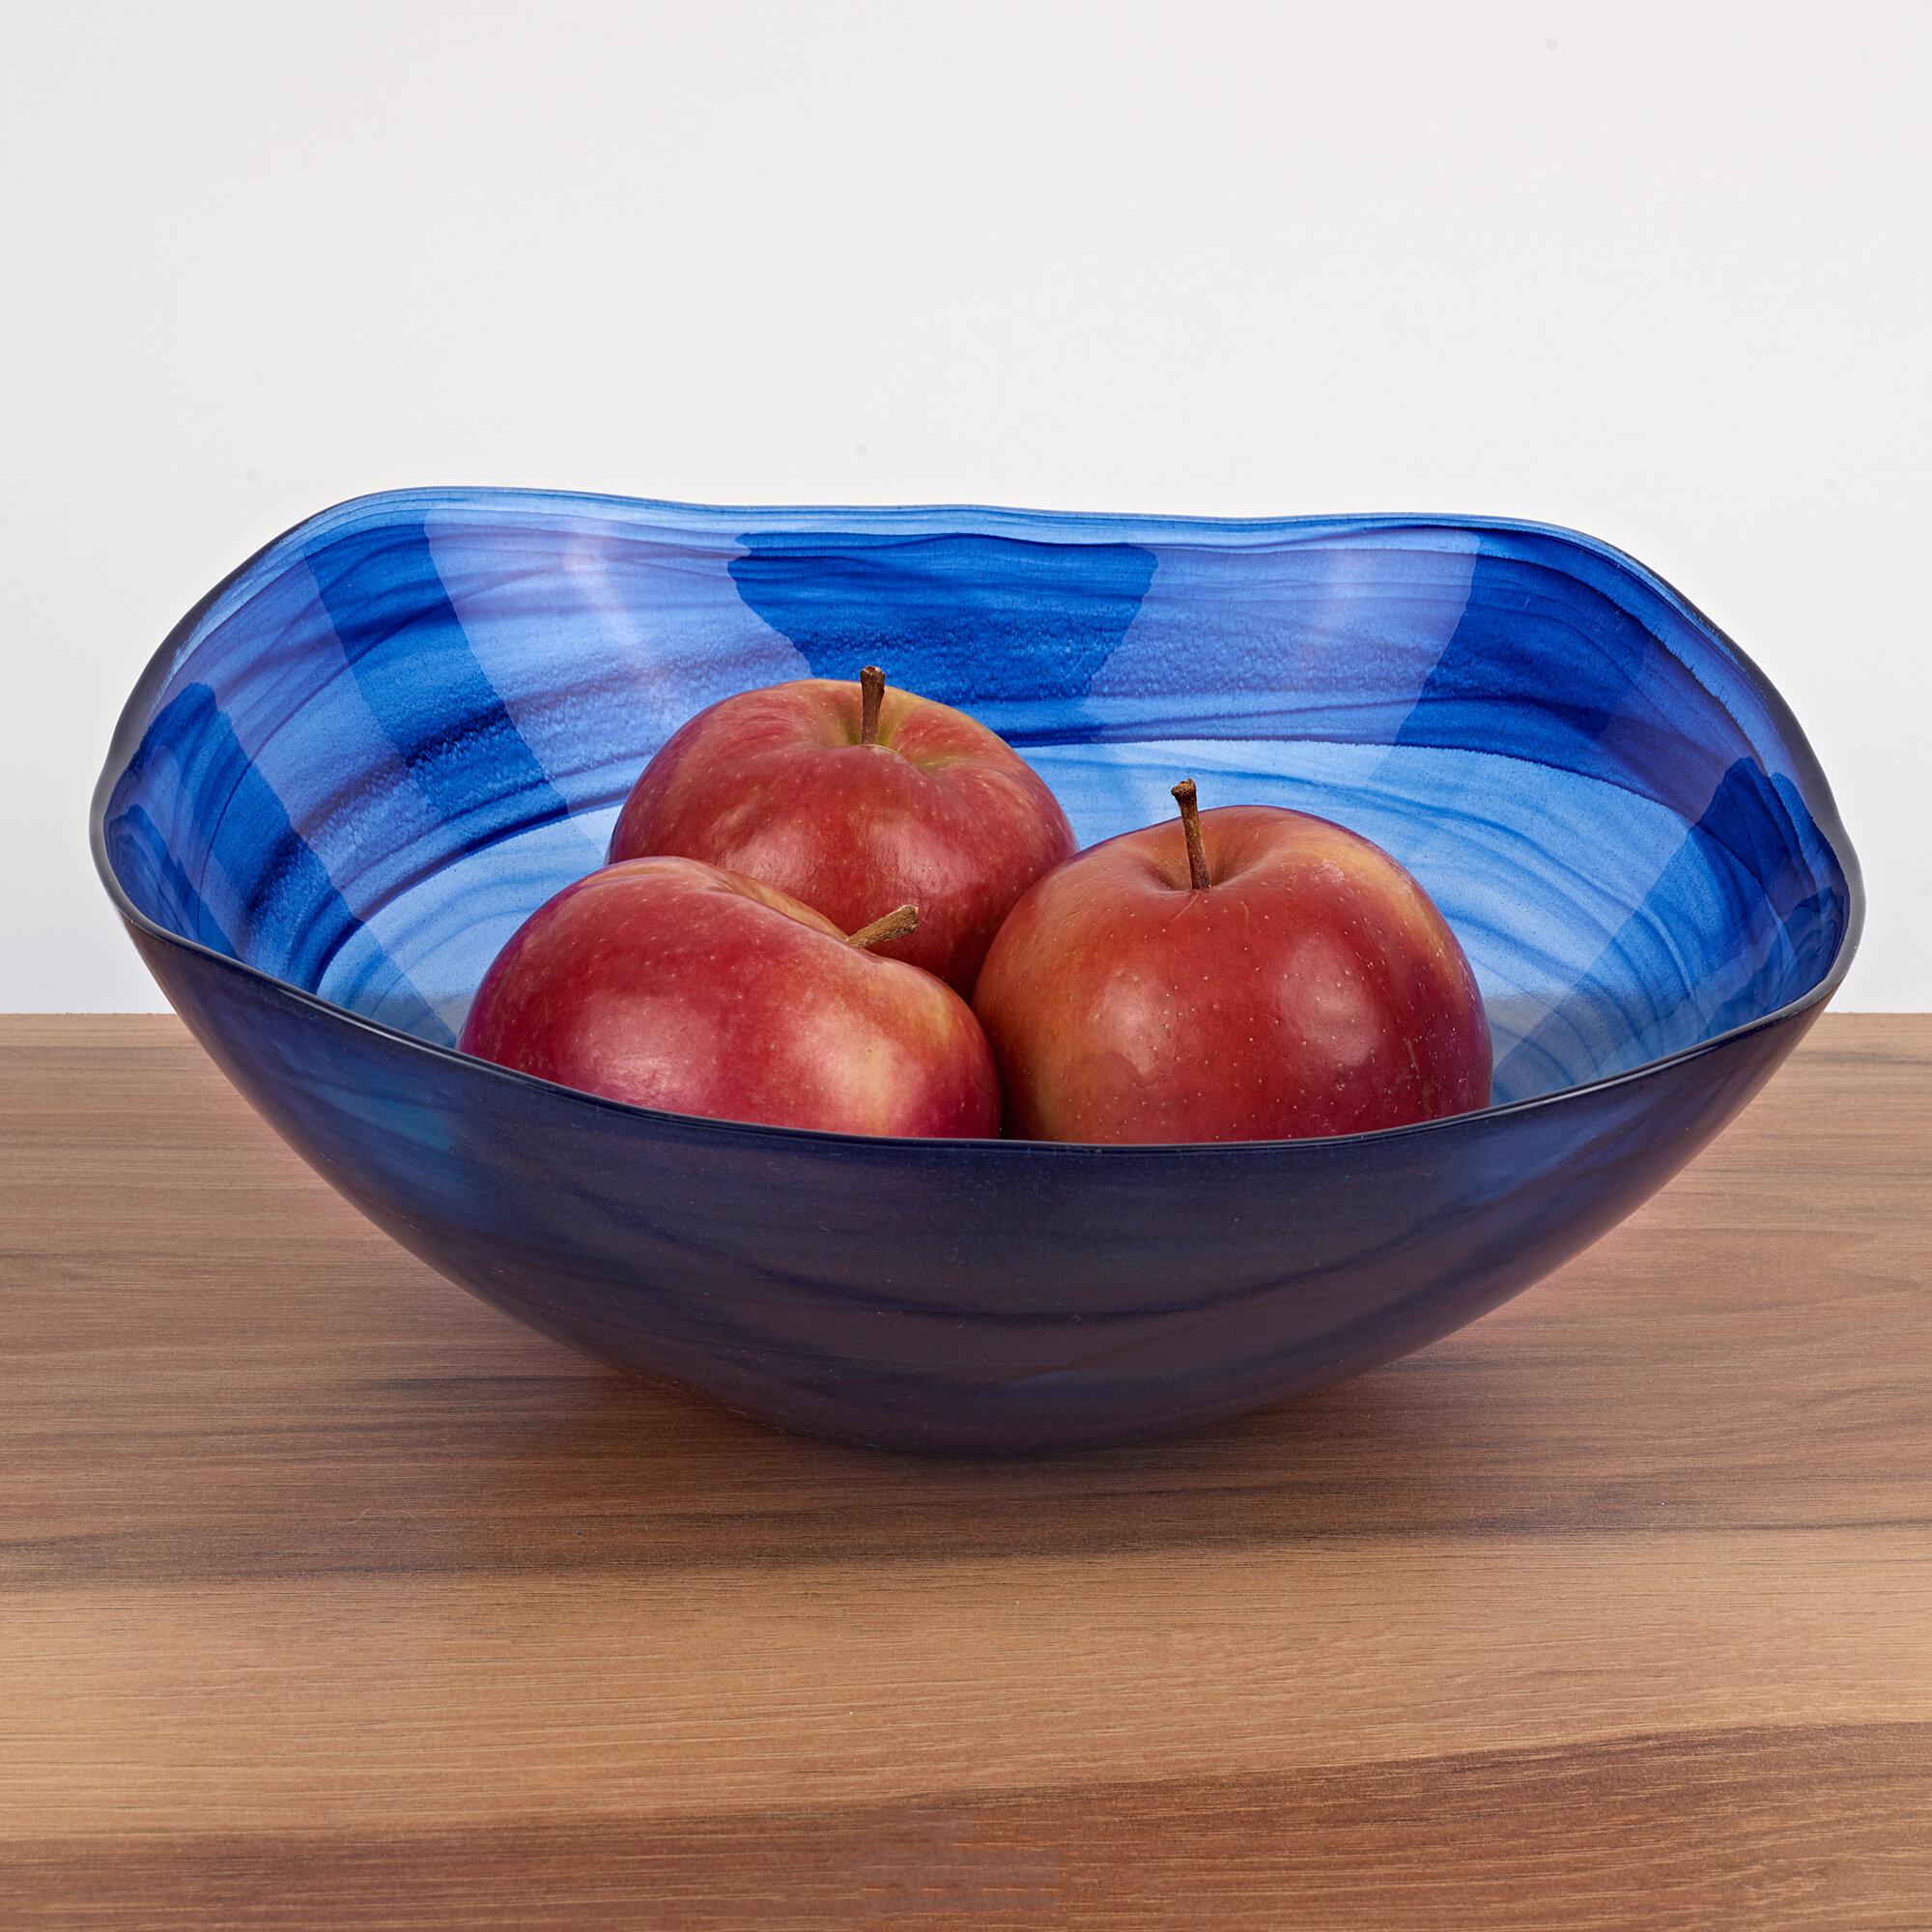 Orren Ellis Decorative Plates Bowls You Ll Love In 2021 Wayfair